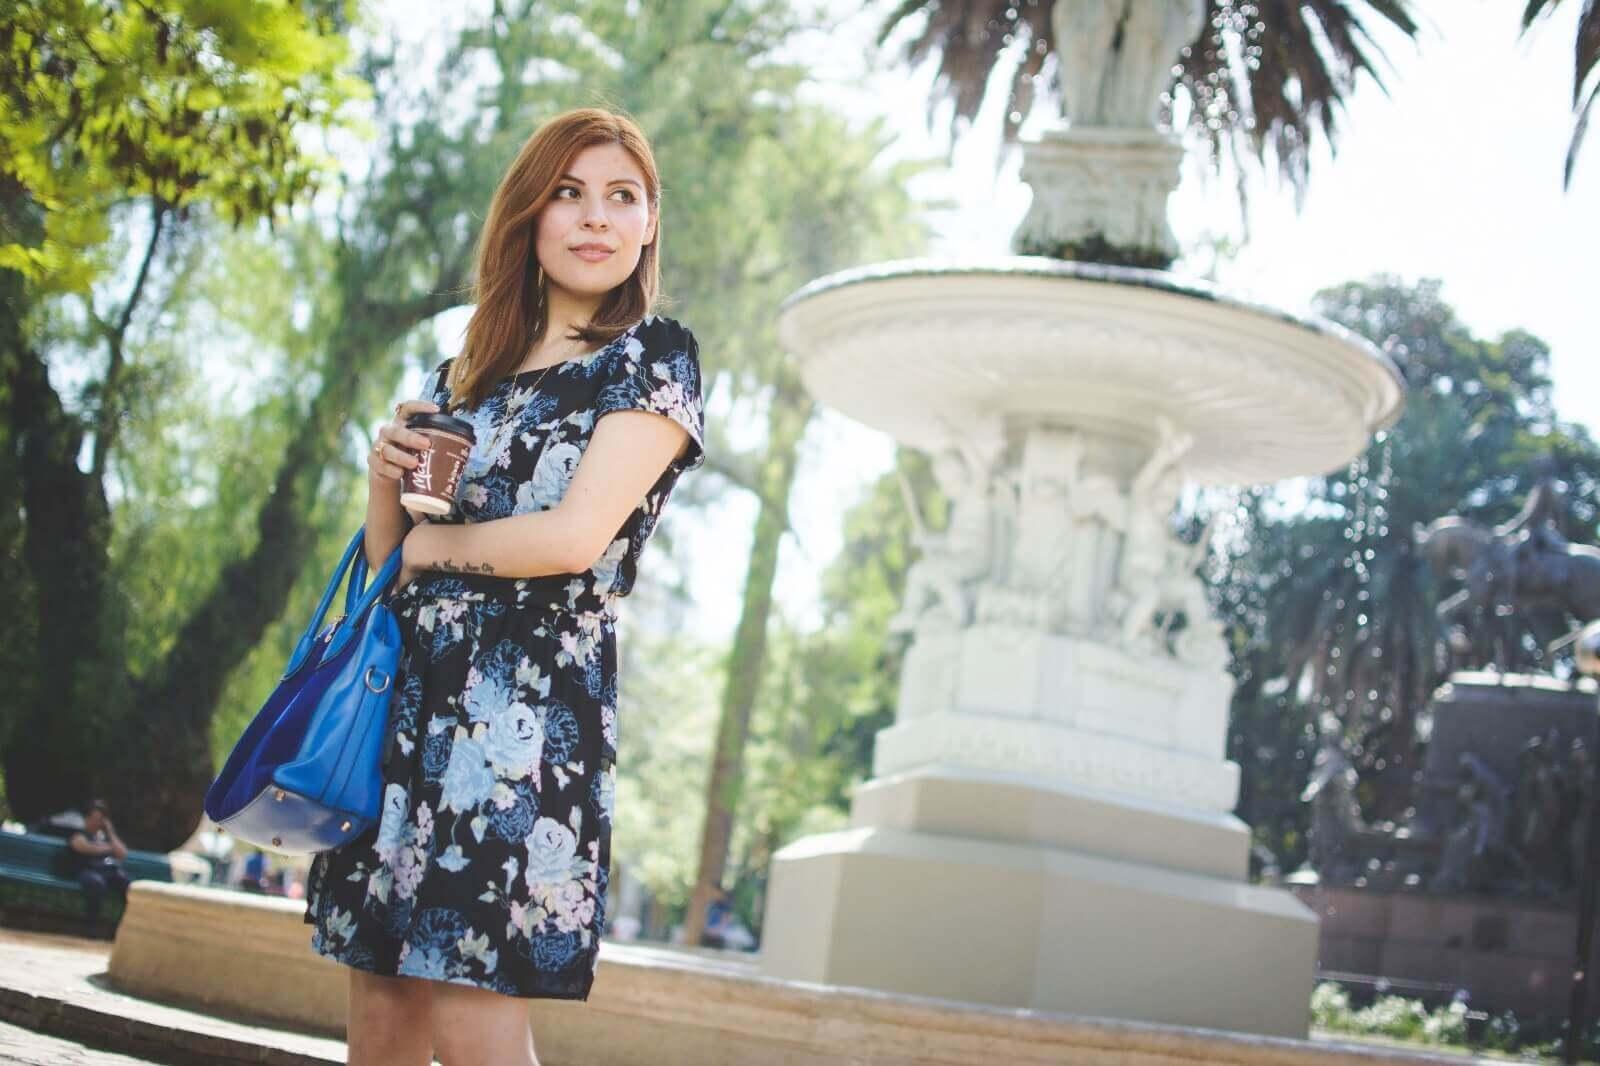 gamiss-black-strappy-sandals-blue-floral-dress-rosegal-cobalt-blue-tote-bag-deborah-ferrero-style-by-deb10